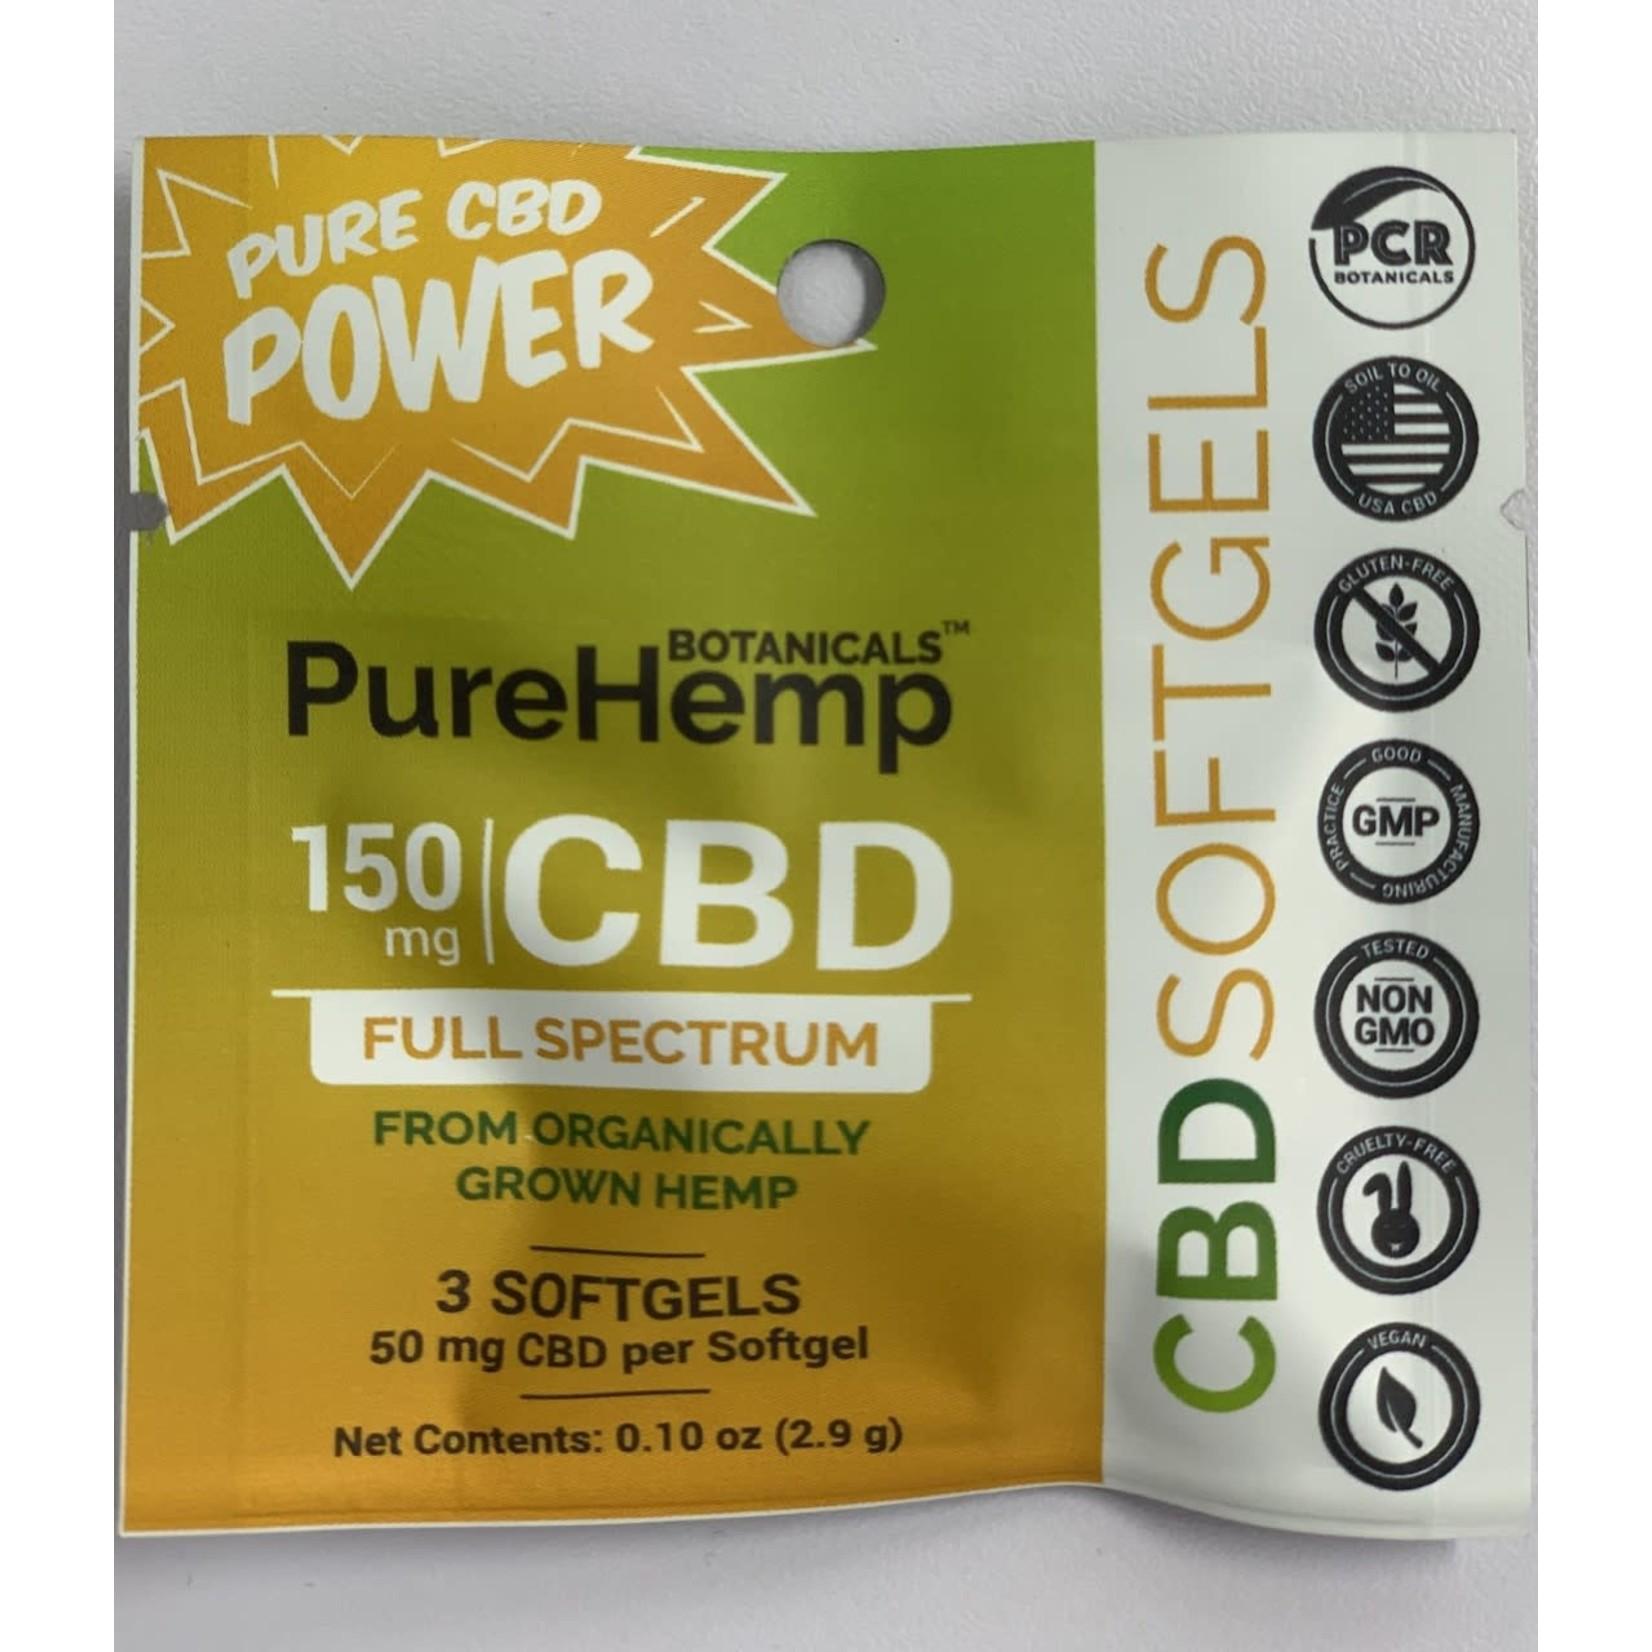 Pure Hemp Botanicals PHB Softgels Sample 150mg CBD capsule 3 count